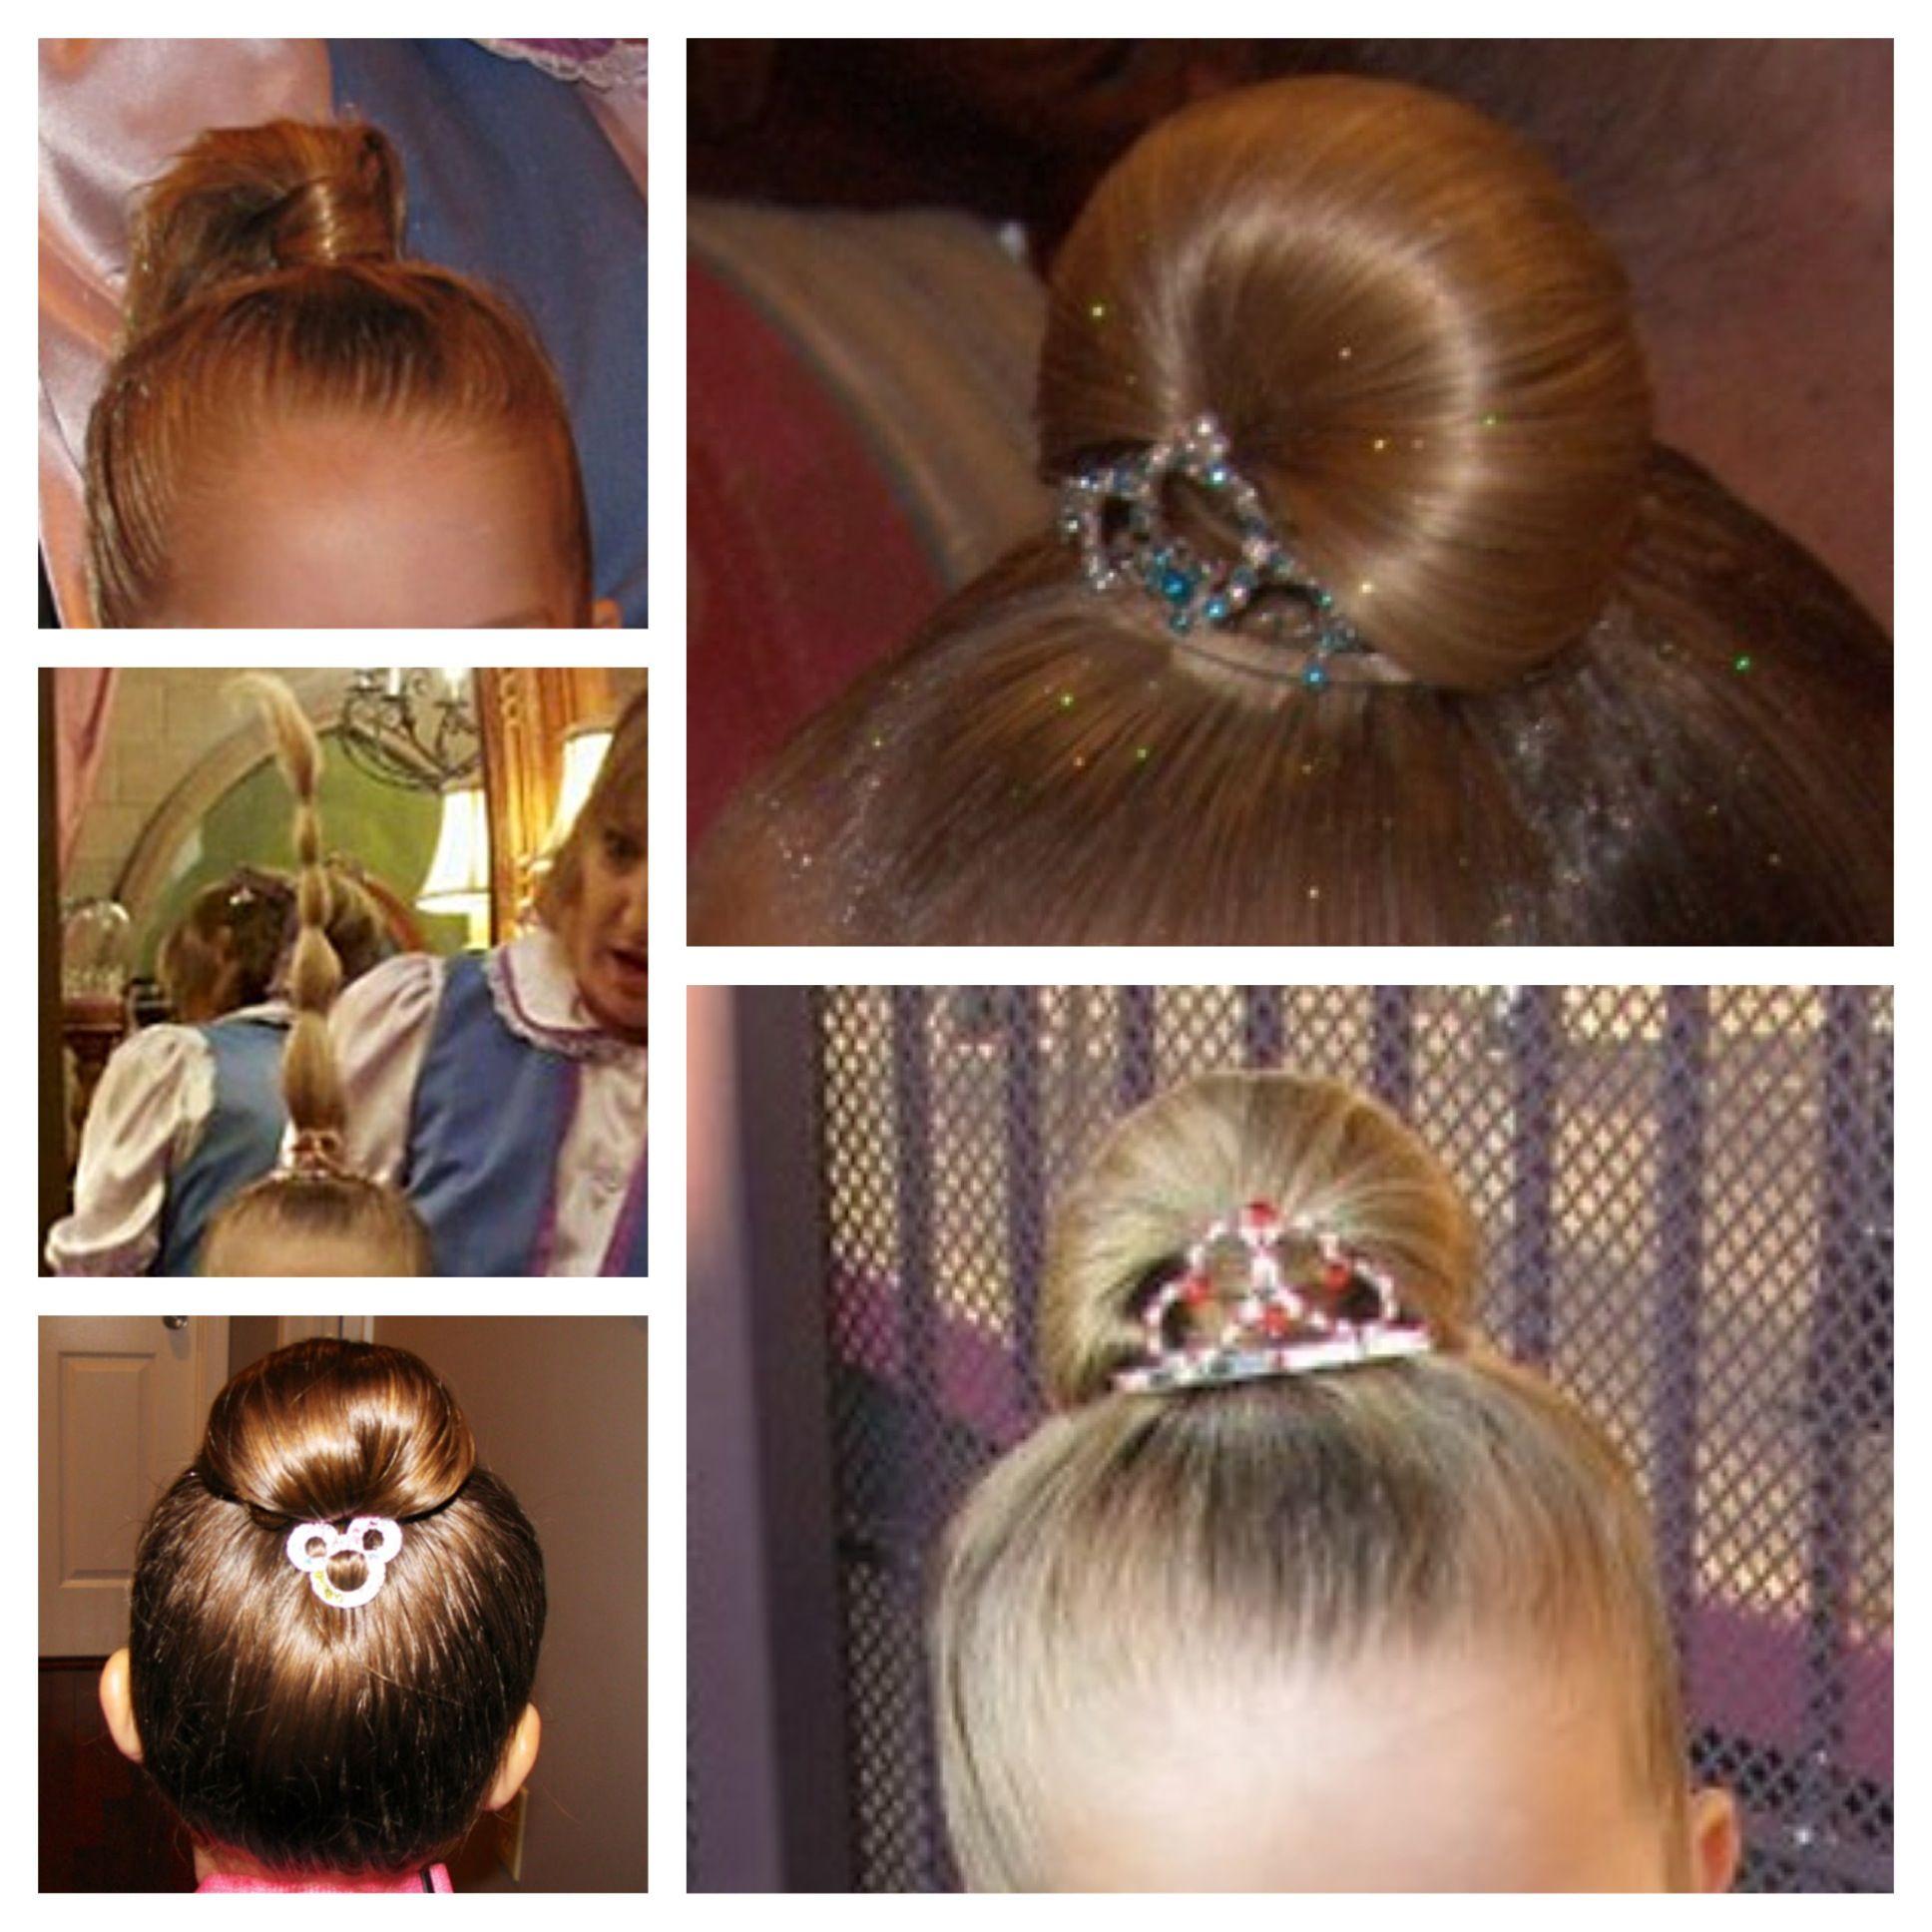 Awe inspiring pinterest the world39s catalog of ideas updo hairstyles - You Can Style The Bibbidi Bobbidi Boutique Fairytale Princess Hair Style Diy Make Sure